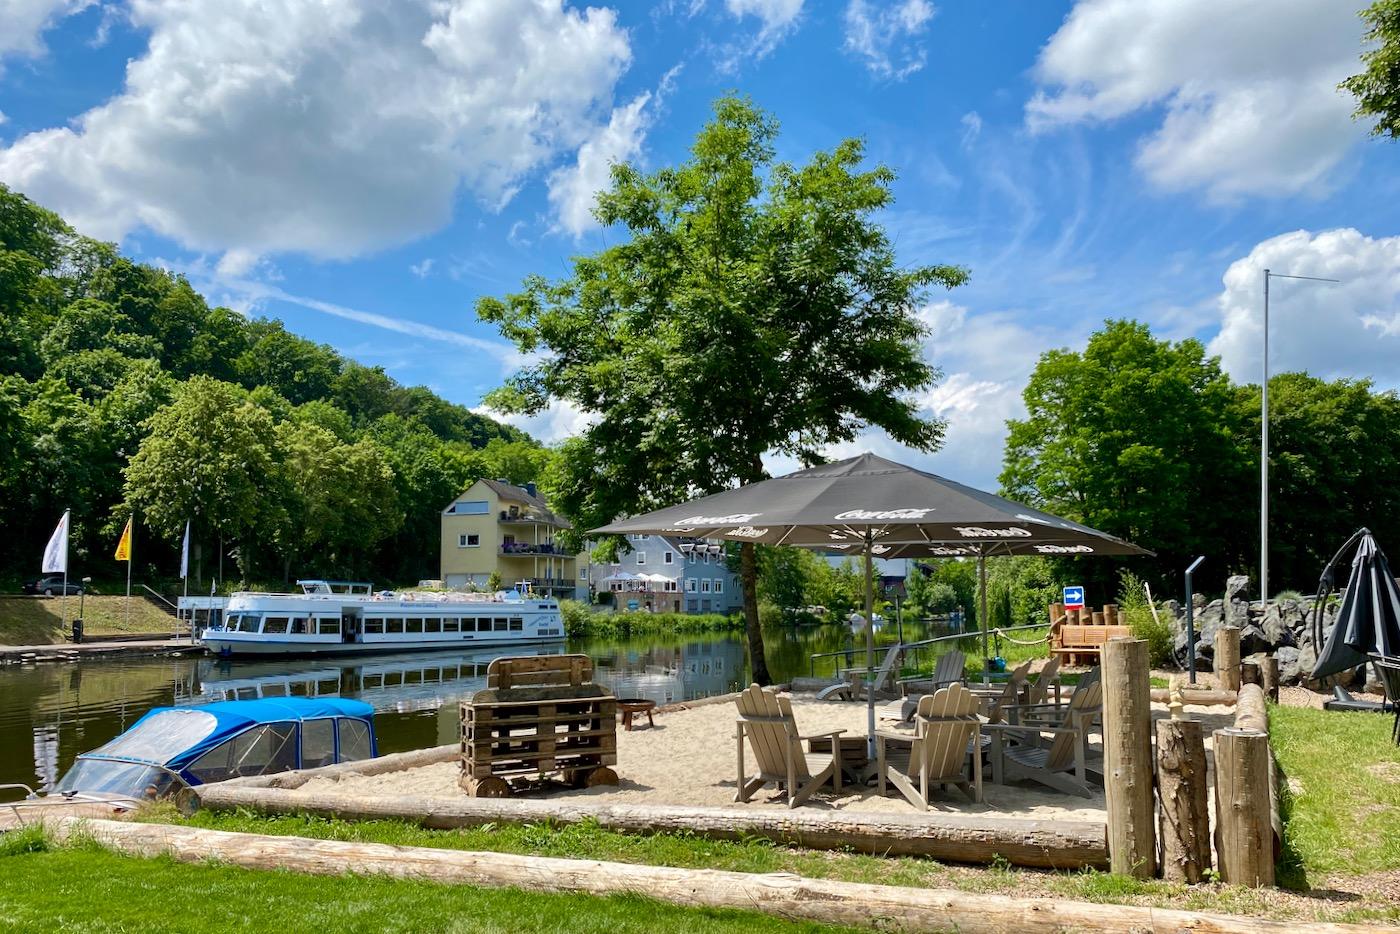 Camping Resort Limburg